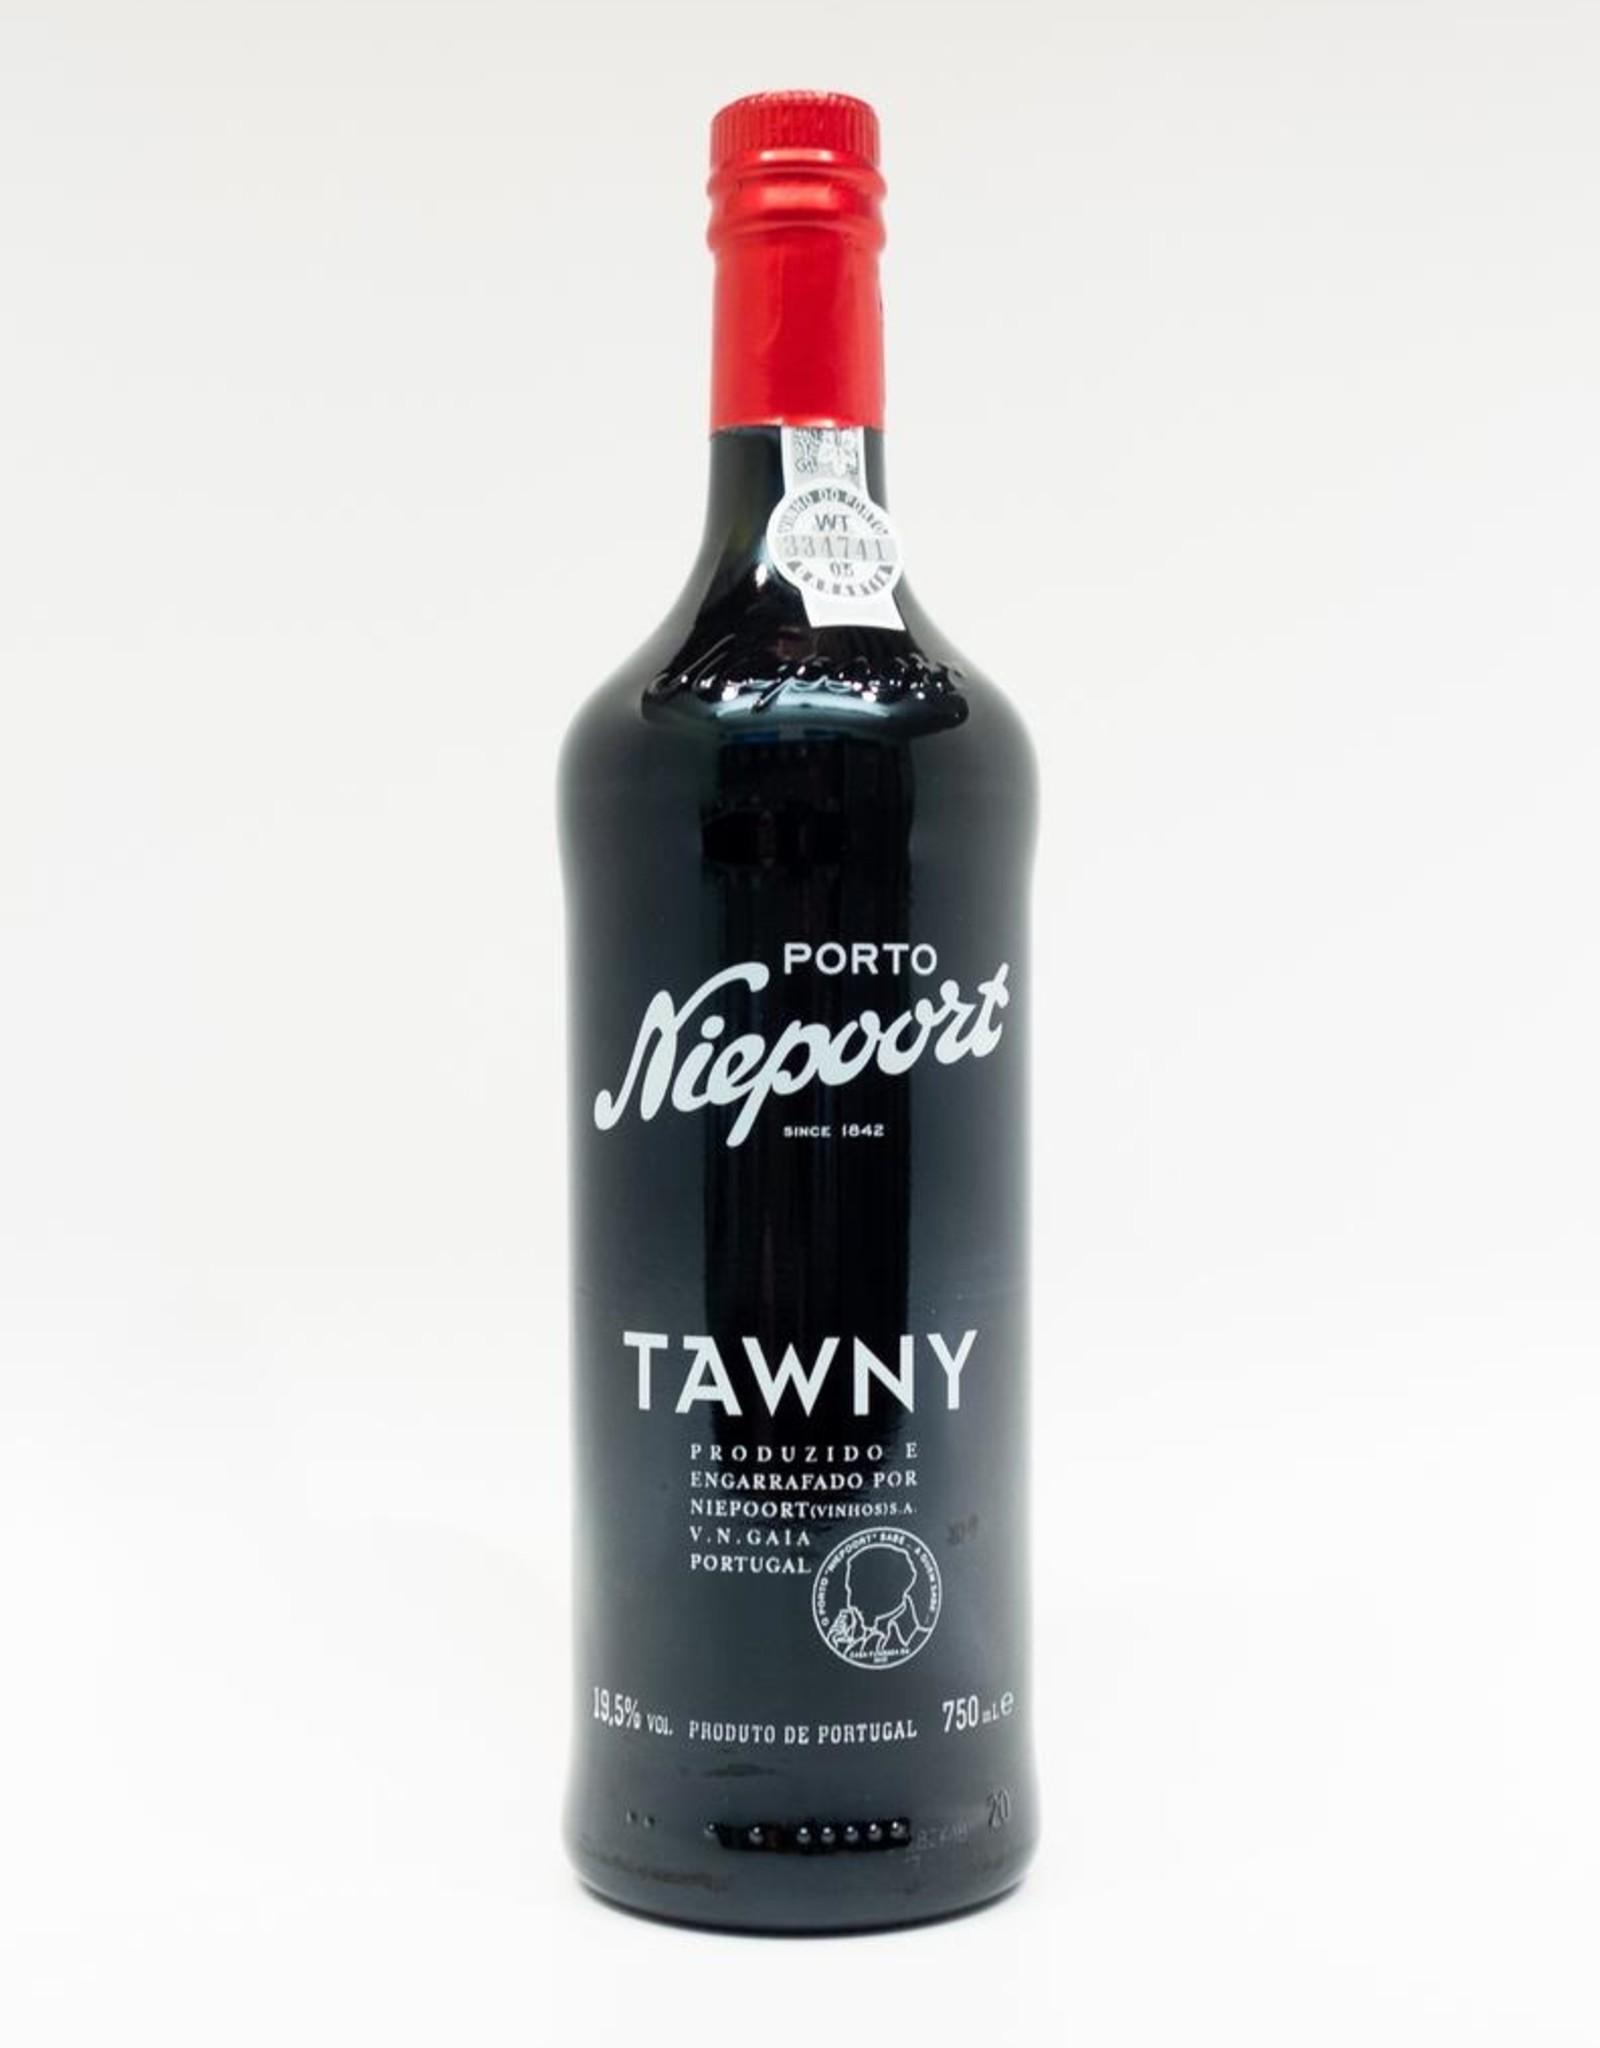 Wine-Fortified-Port Niepoort Tawny Port